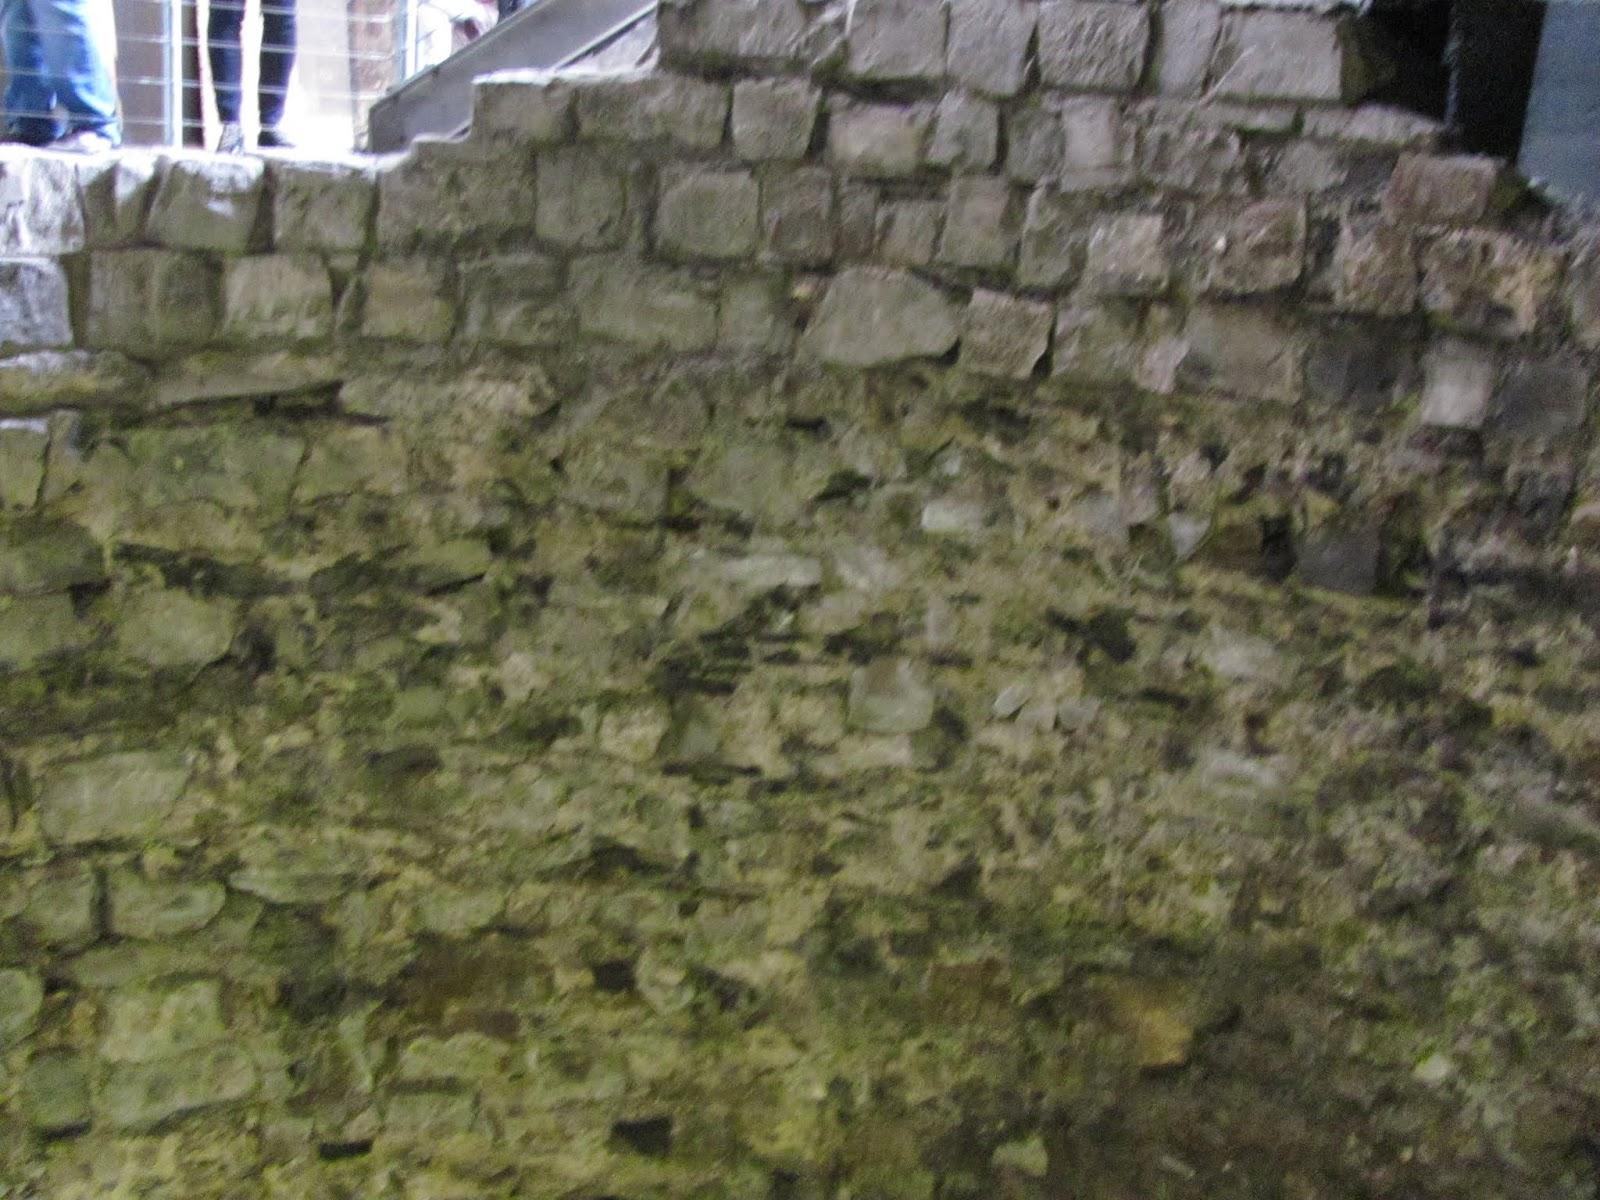 Norman Tower Foundation Dublin Castle